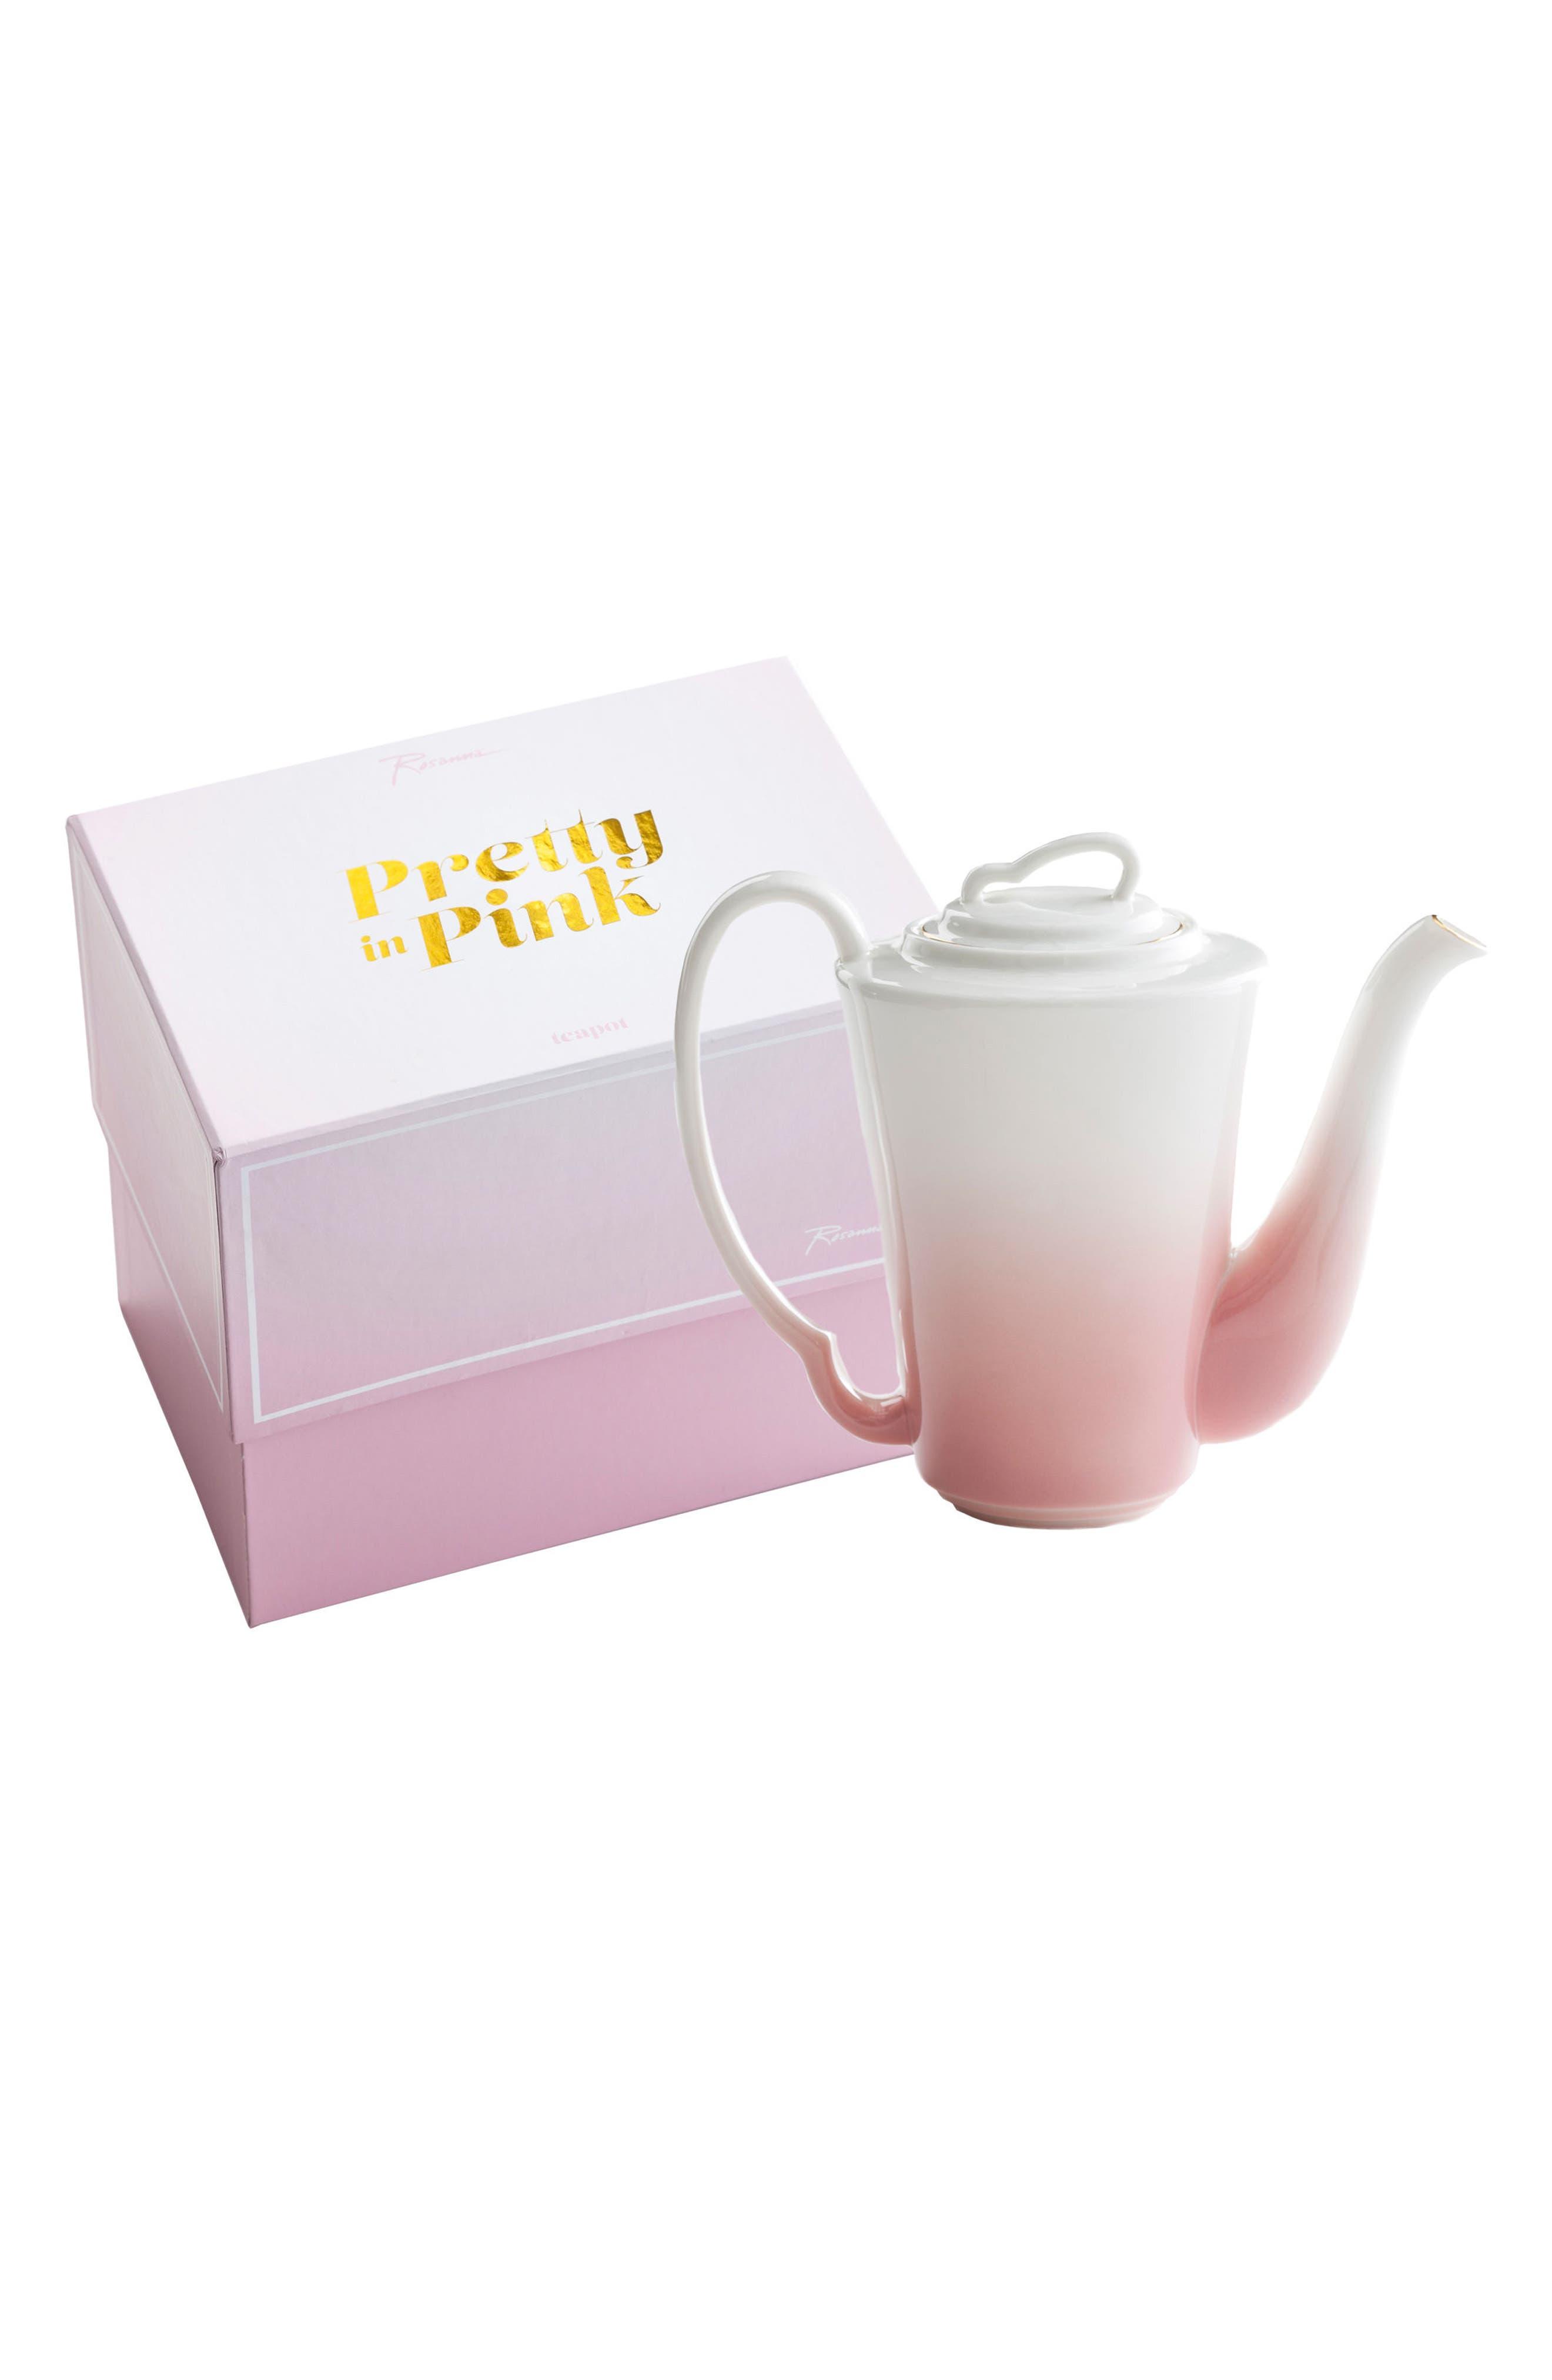 Main Image - Rosanna Pretty In Pink Porcelain Teapot